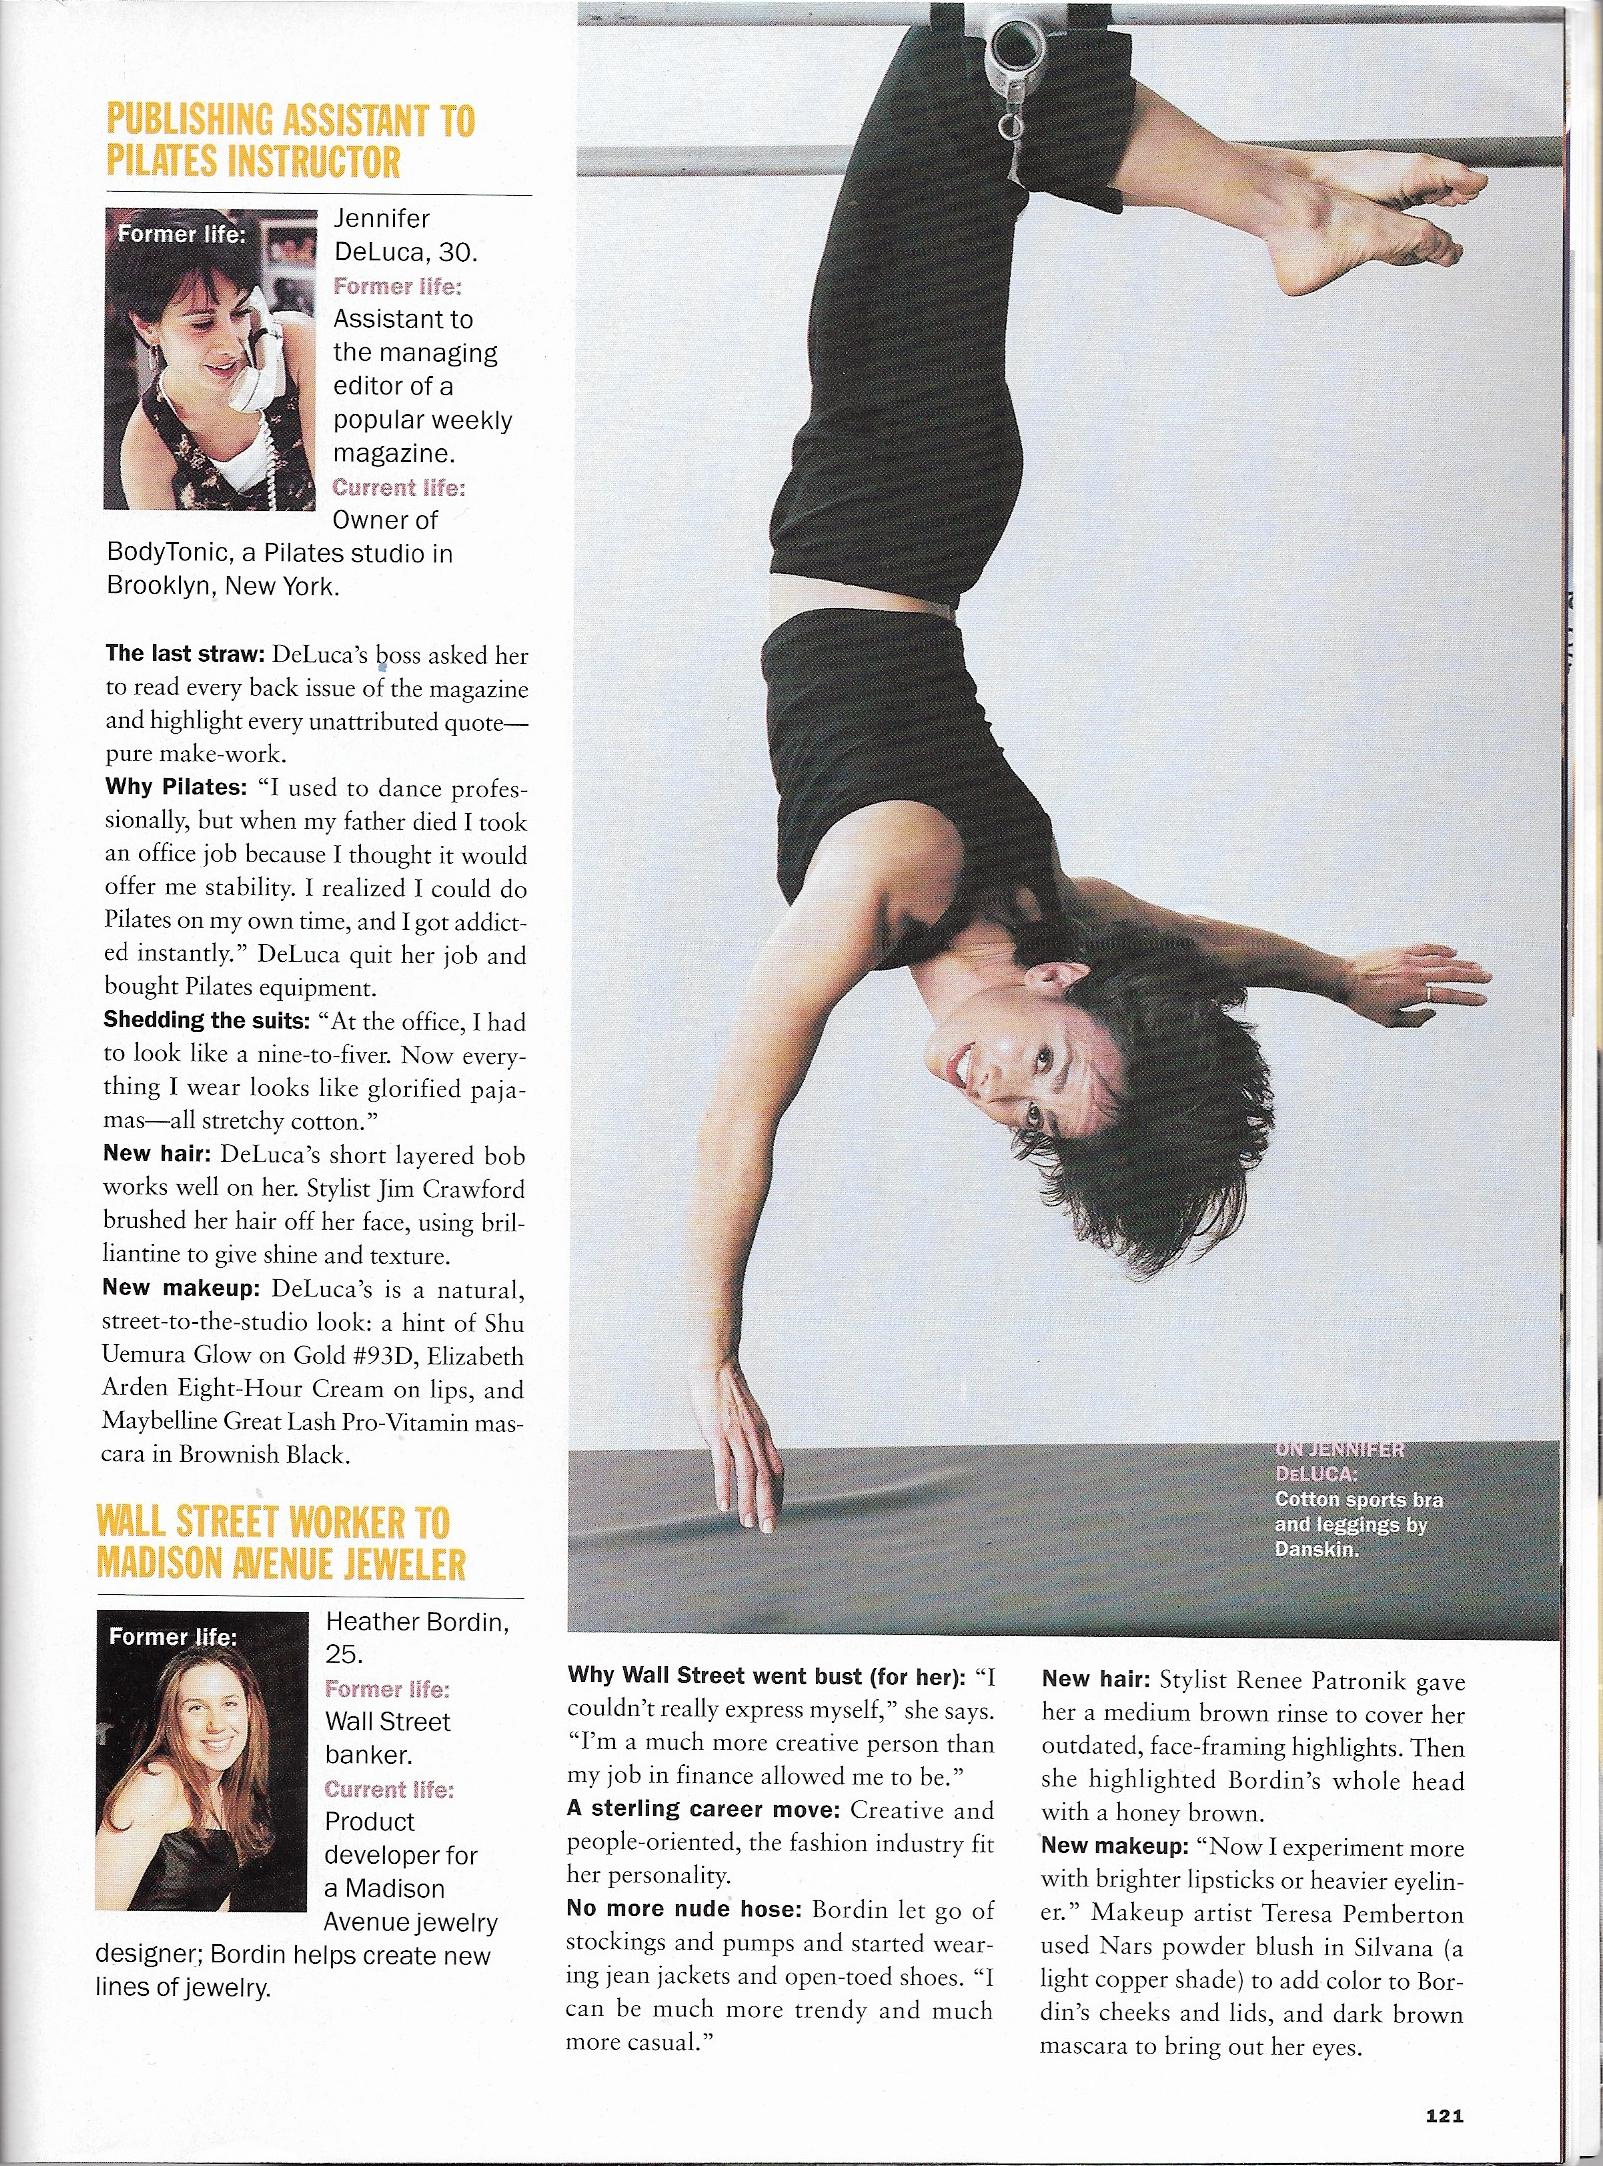 Jennifer DeLuca in Allure Magazine